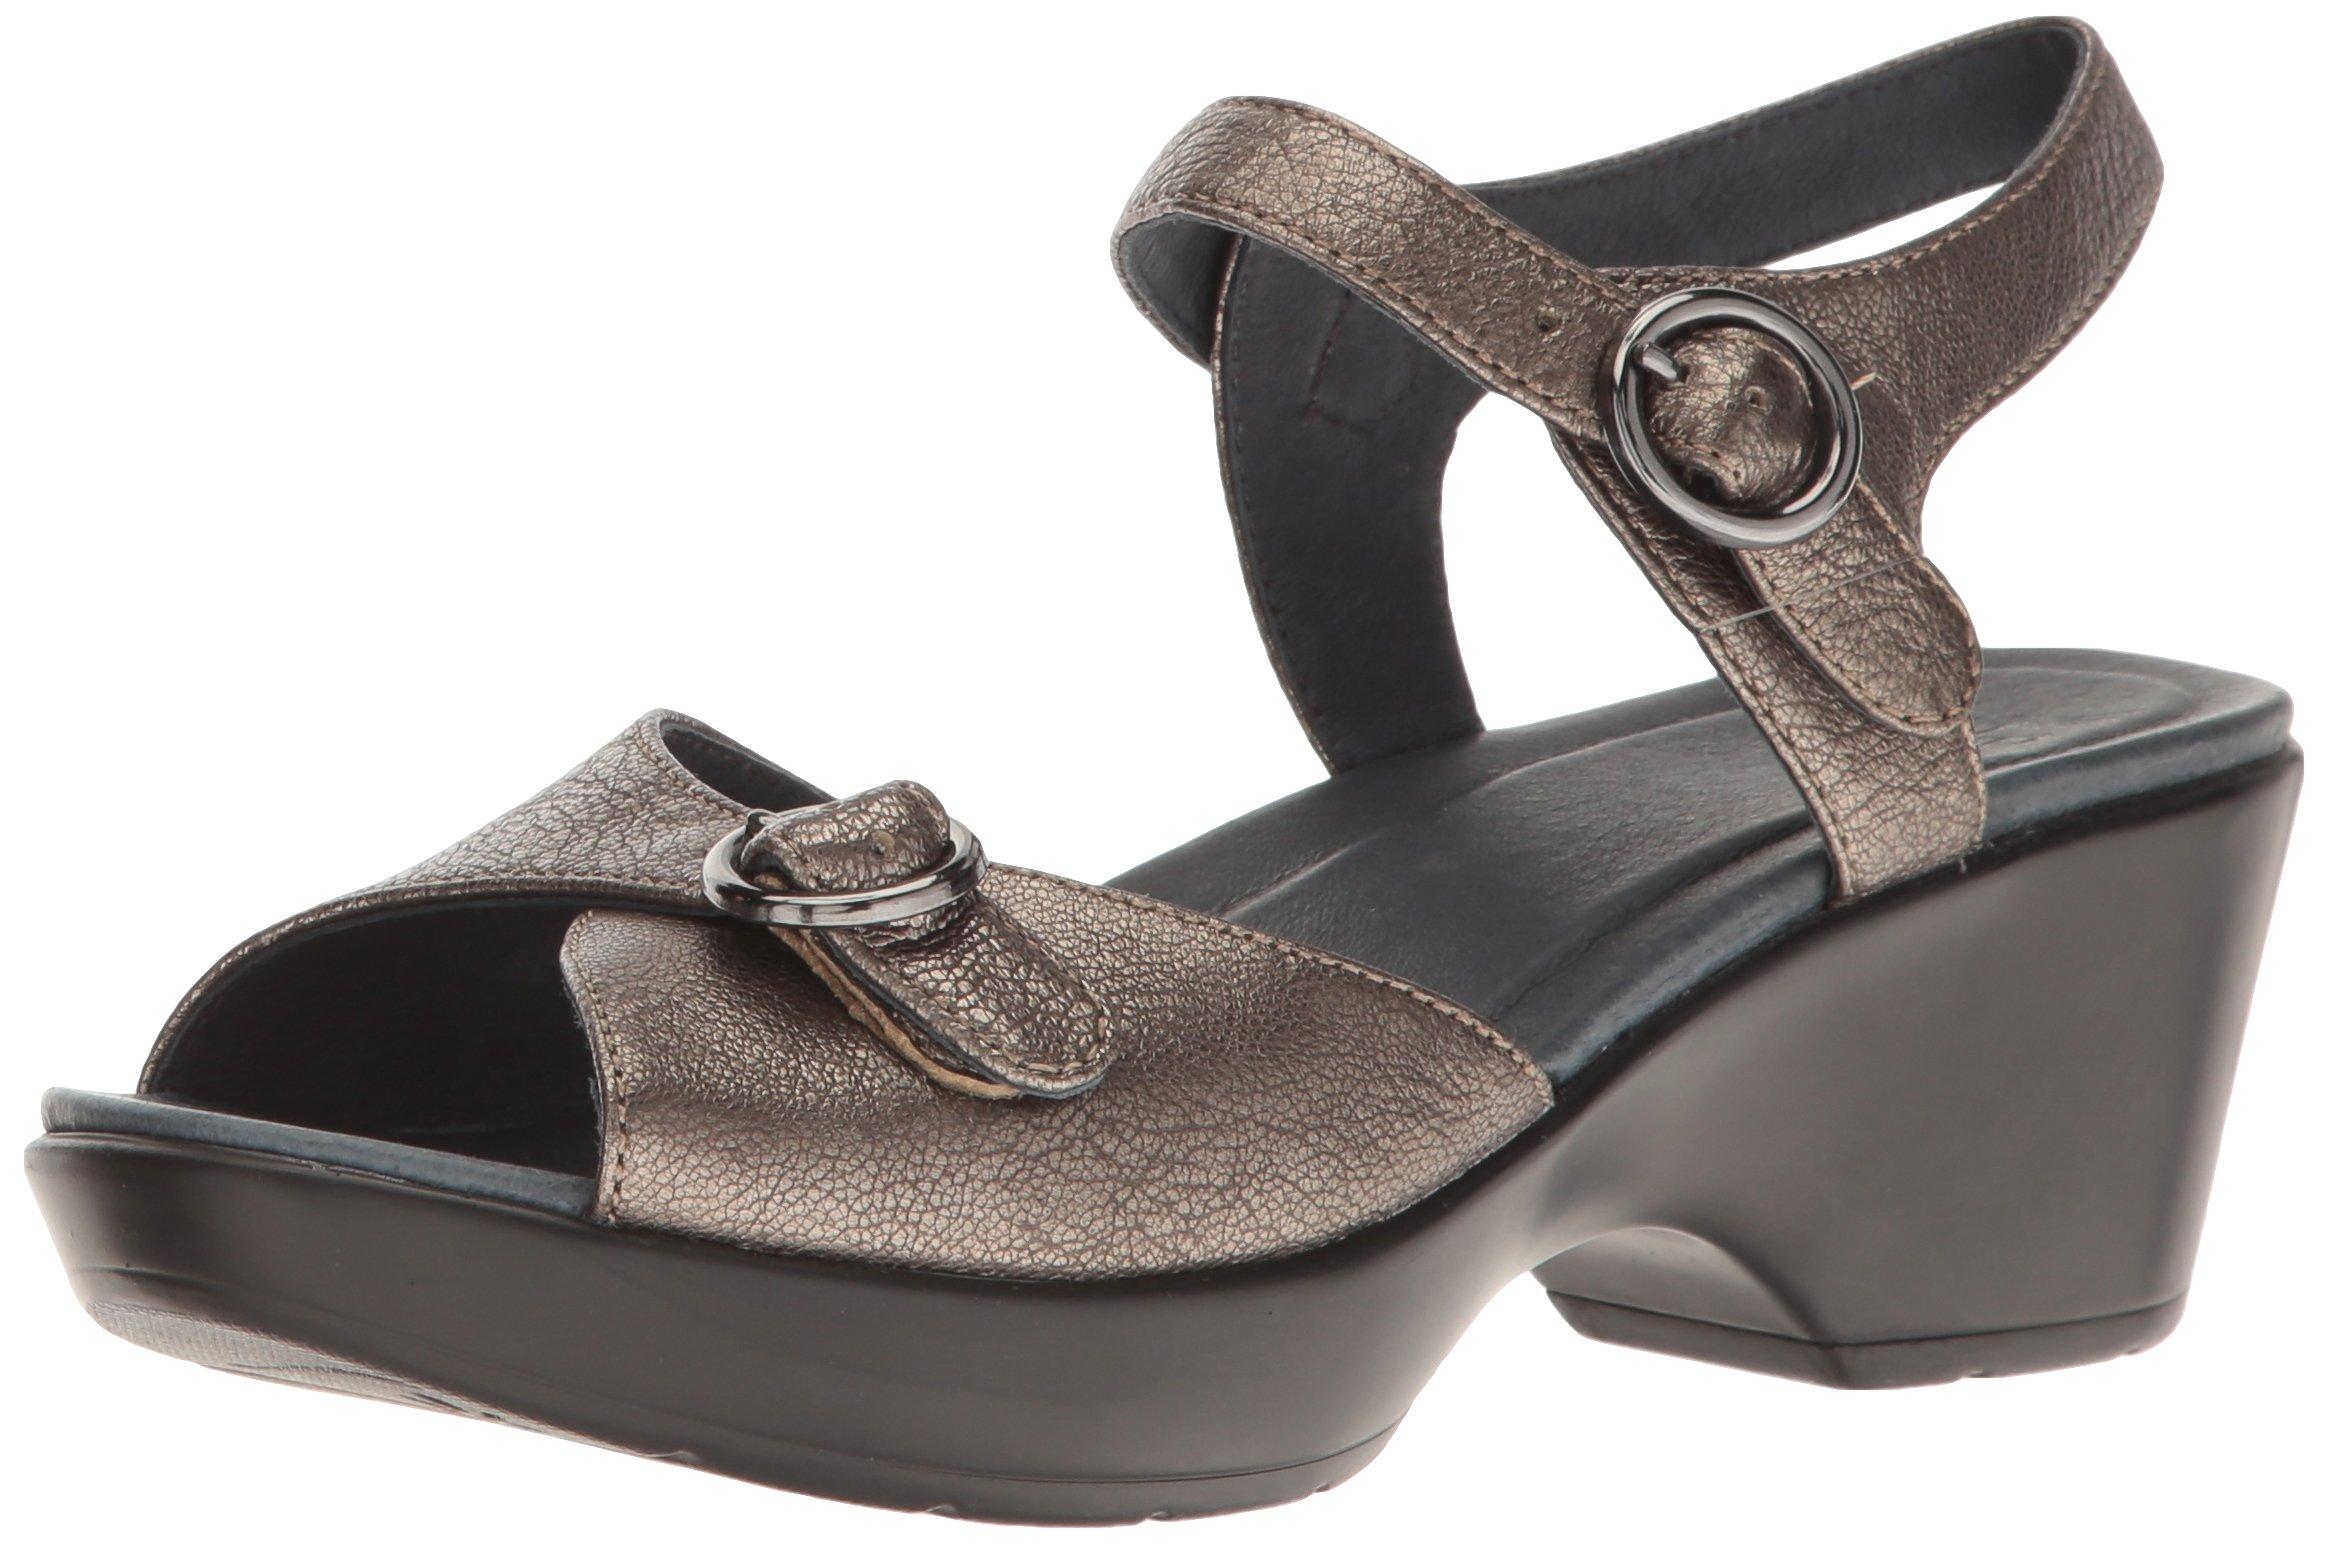 Dansko Women's June Flat Sandal, Pewter Nappa, 36 EU/5.5-6 M US